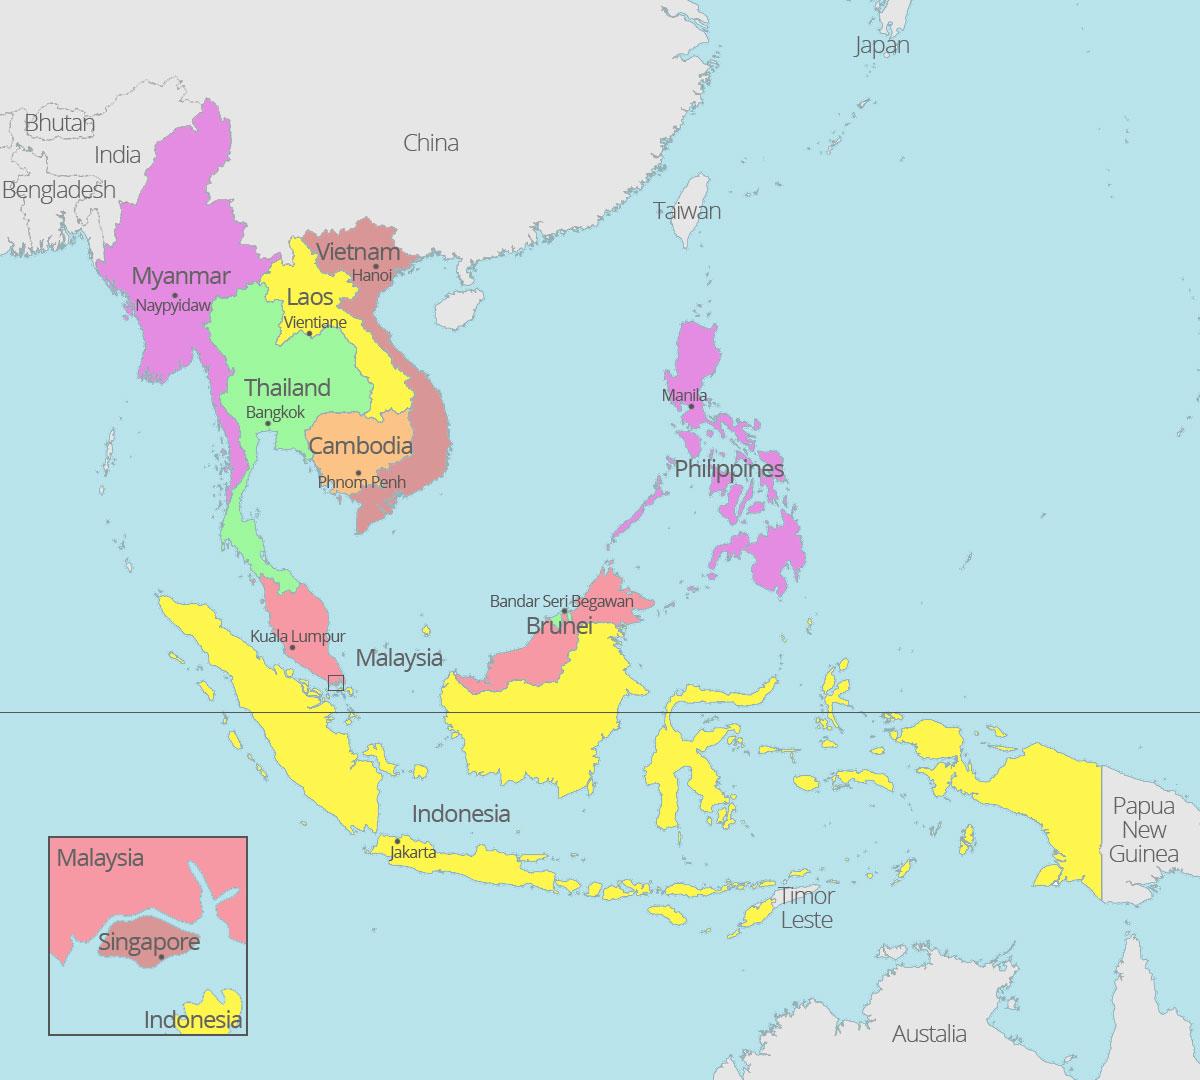 Kang Ade 2017 Asean Beranggotakan 10 Negara Indonesia Malaysia Filipina